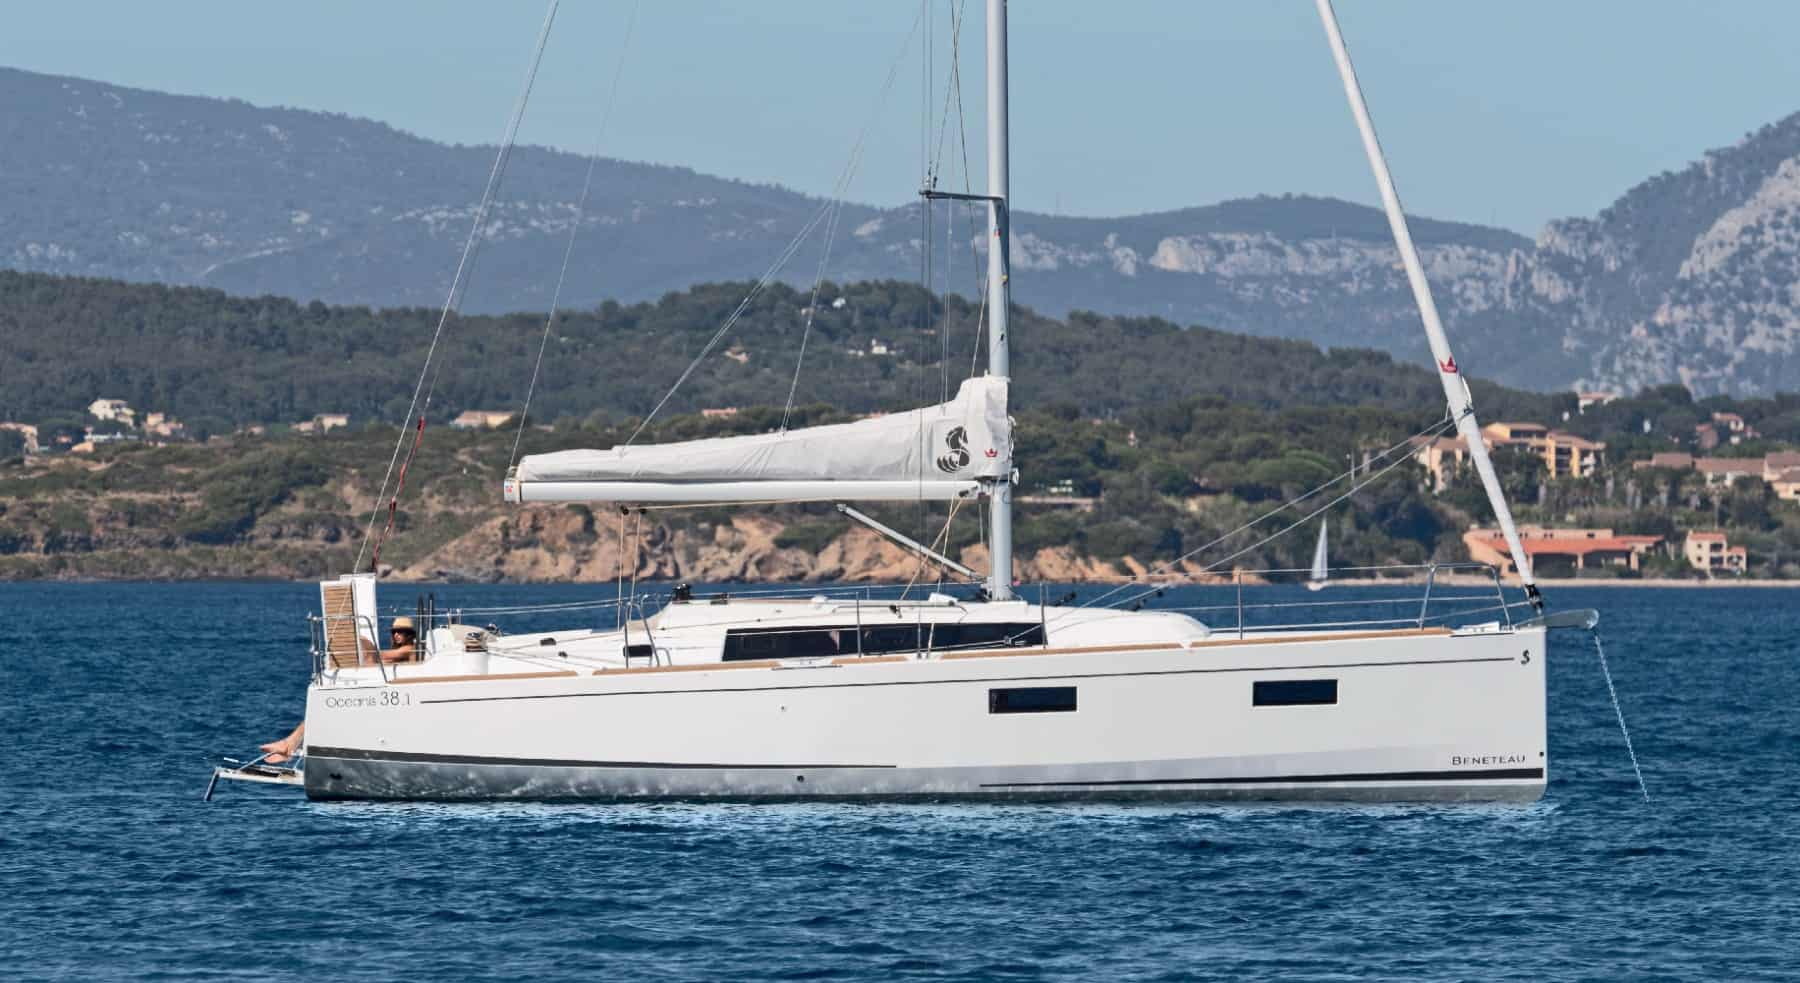 The Beneteau 38.1 calmy crusing down the beautiful coast line of croatia